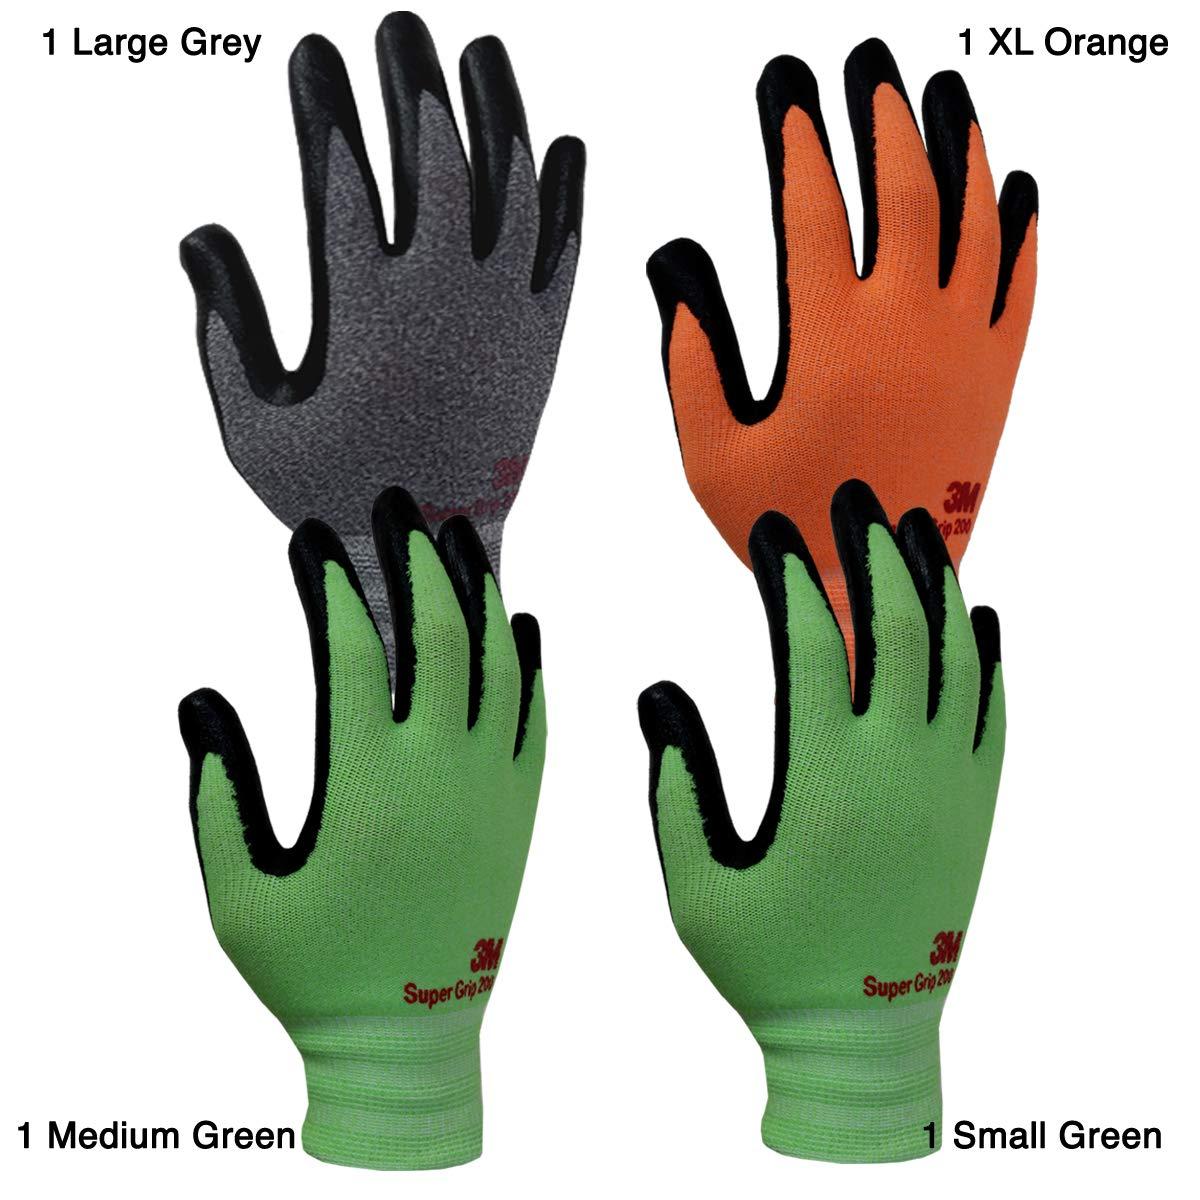 Medium, Orange 5pk 3M Comfortable Grip Nitrile Foam Coated Gardening Work Gloves